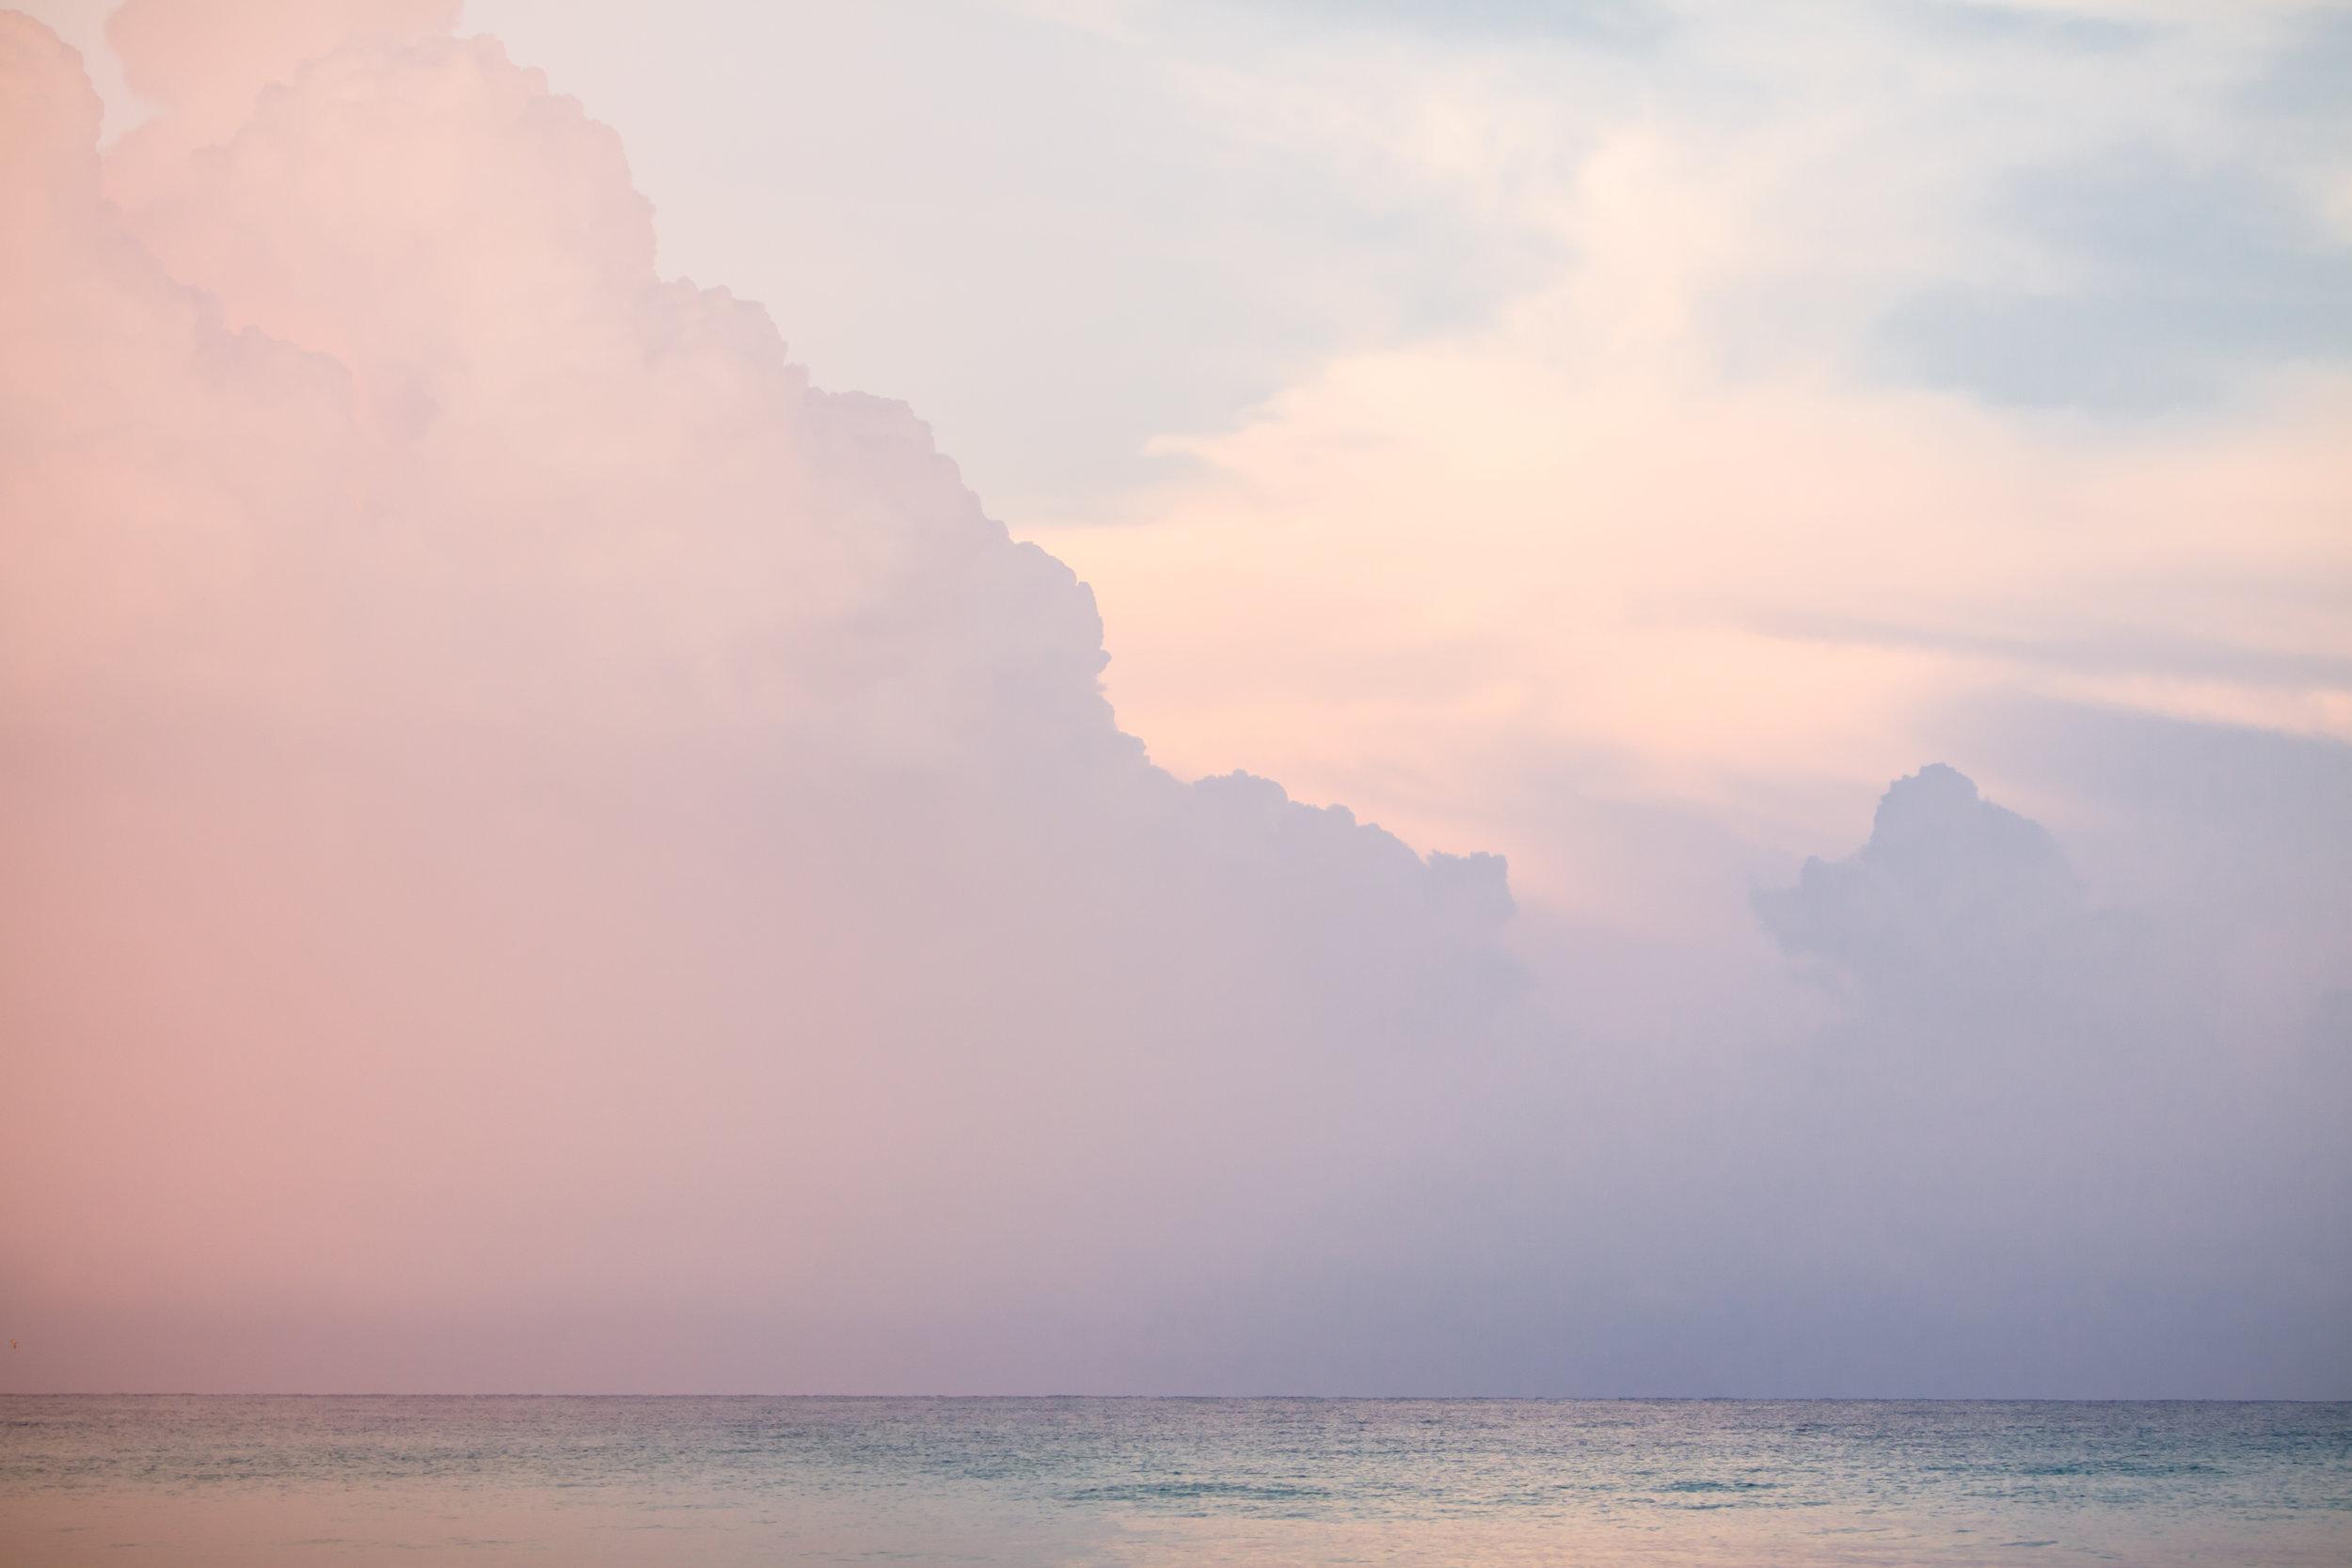 Gulf Coast, Florida